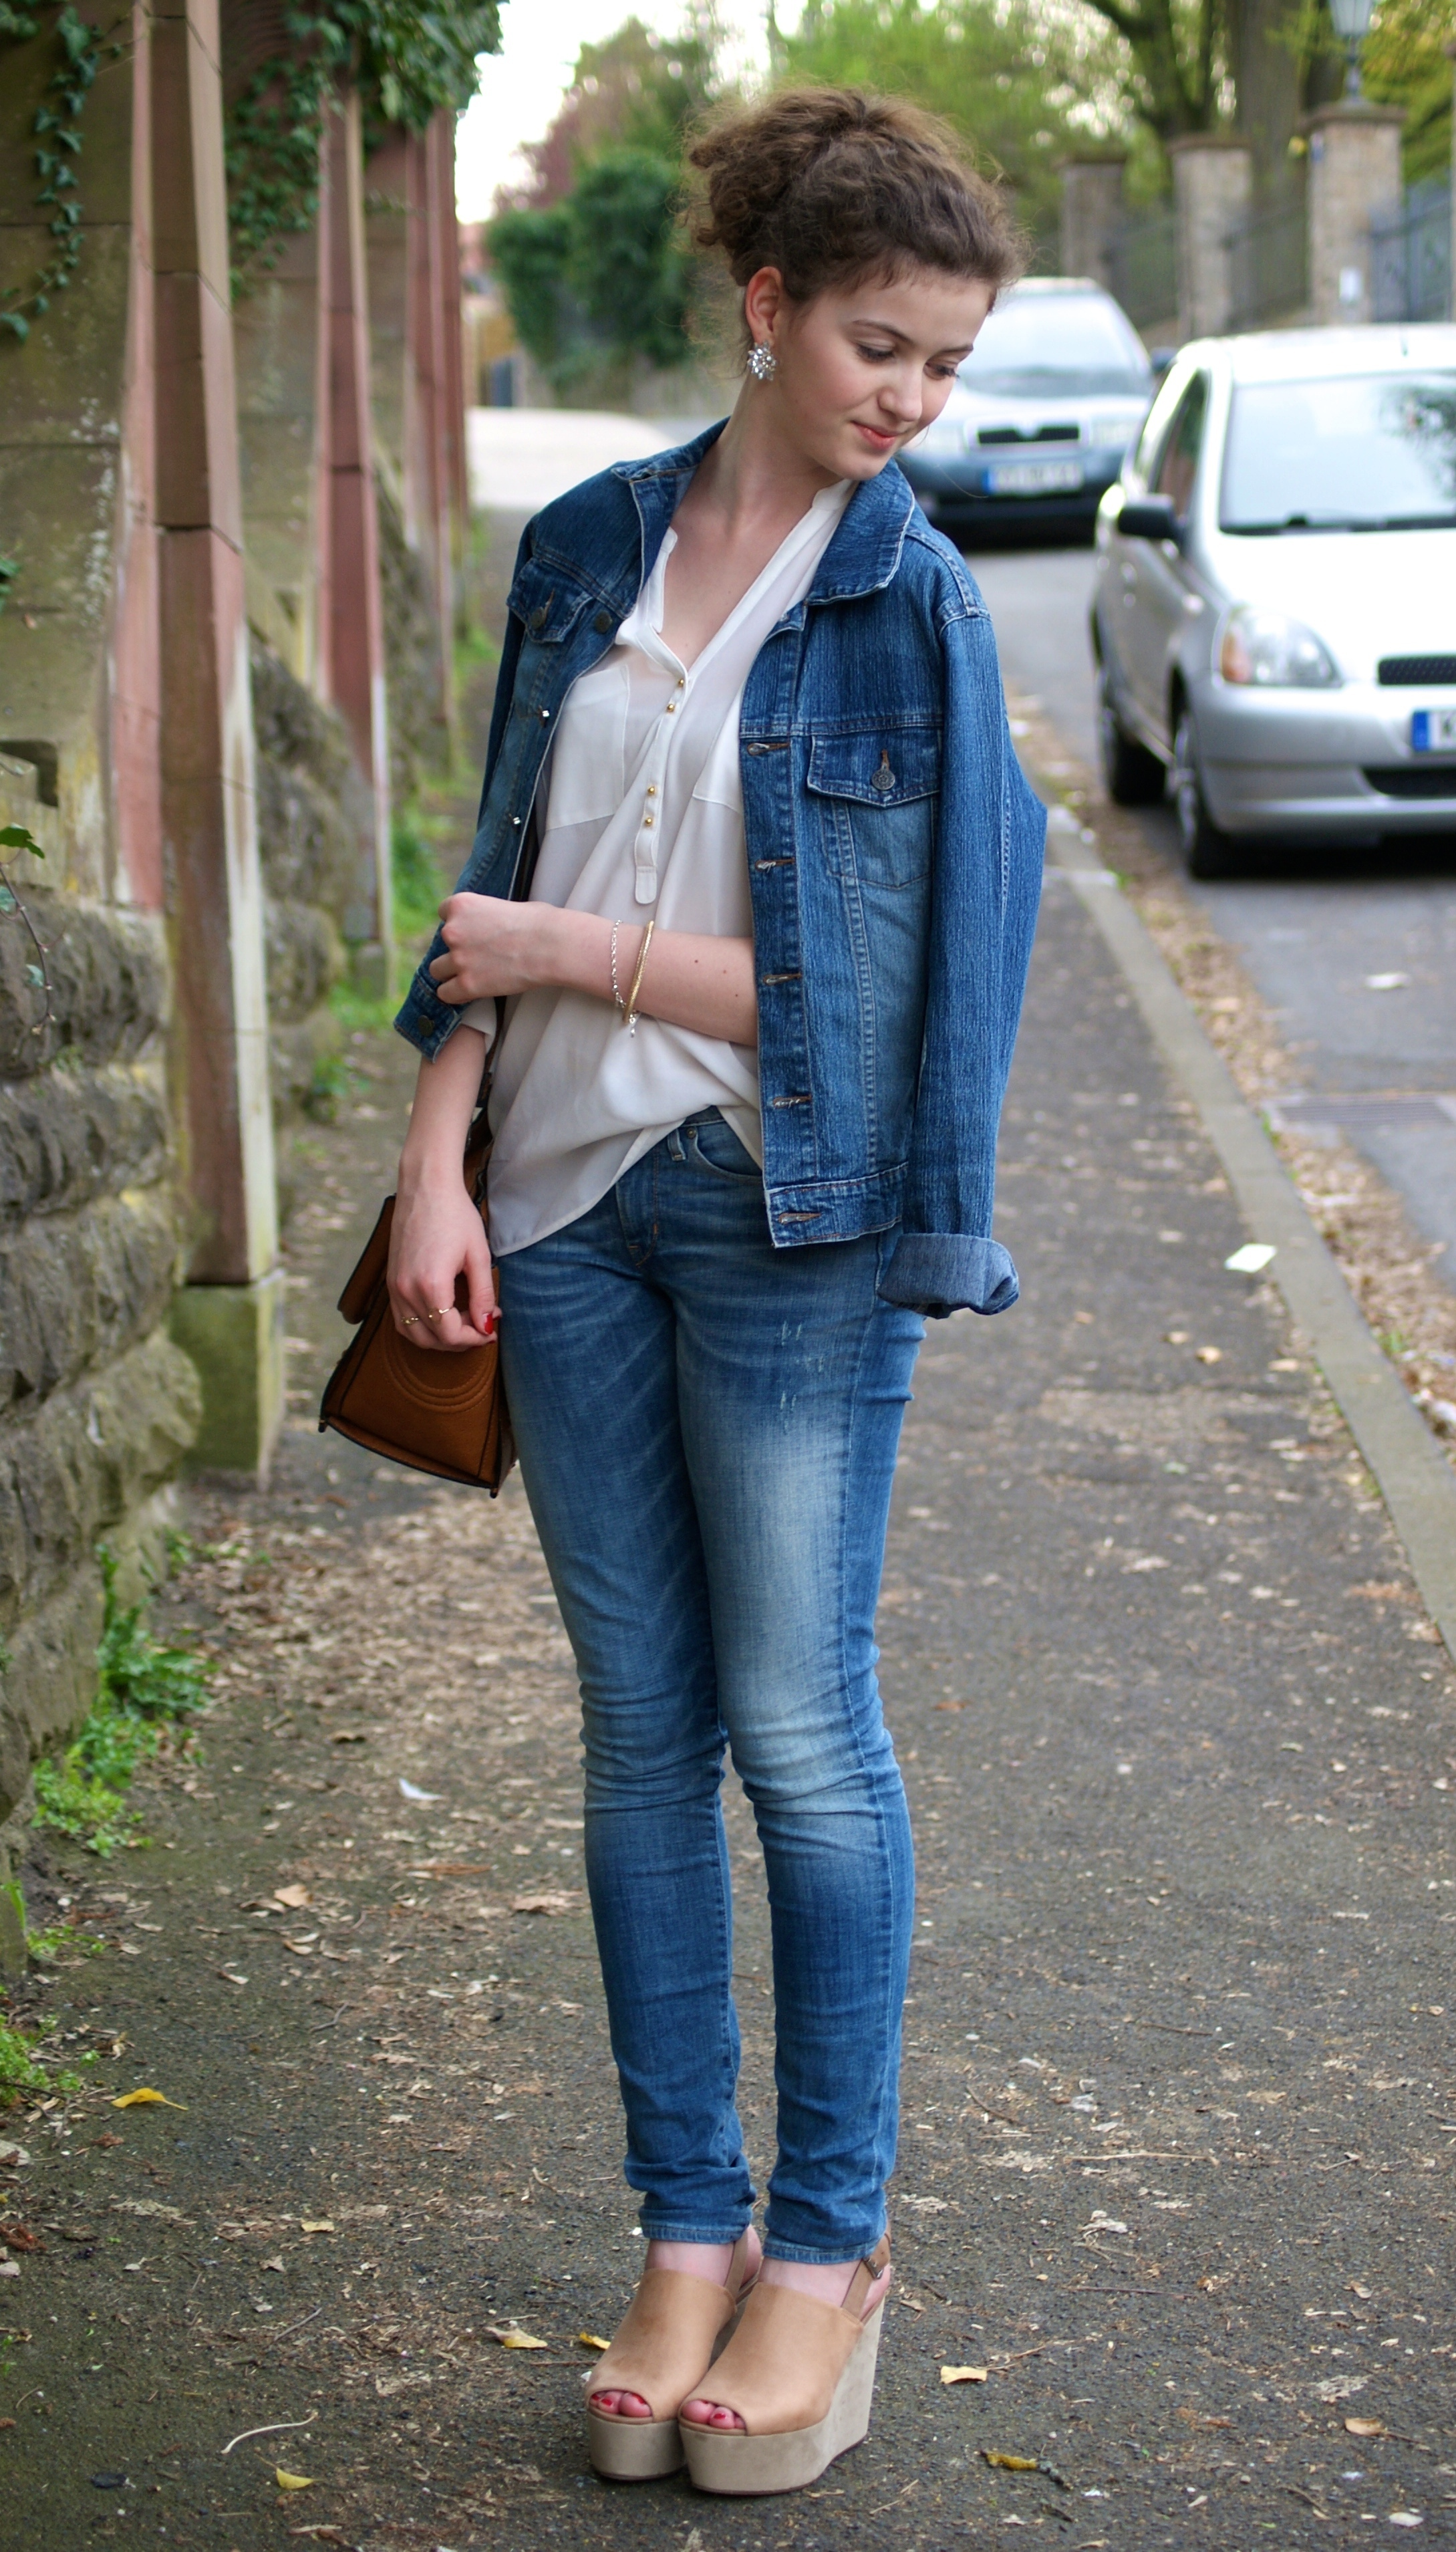 Women's Blue Denim Jacket, White Button Down Blouse, Blue Jeans, Tan  Leather Wedge Sandals | Women's Fashion